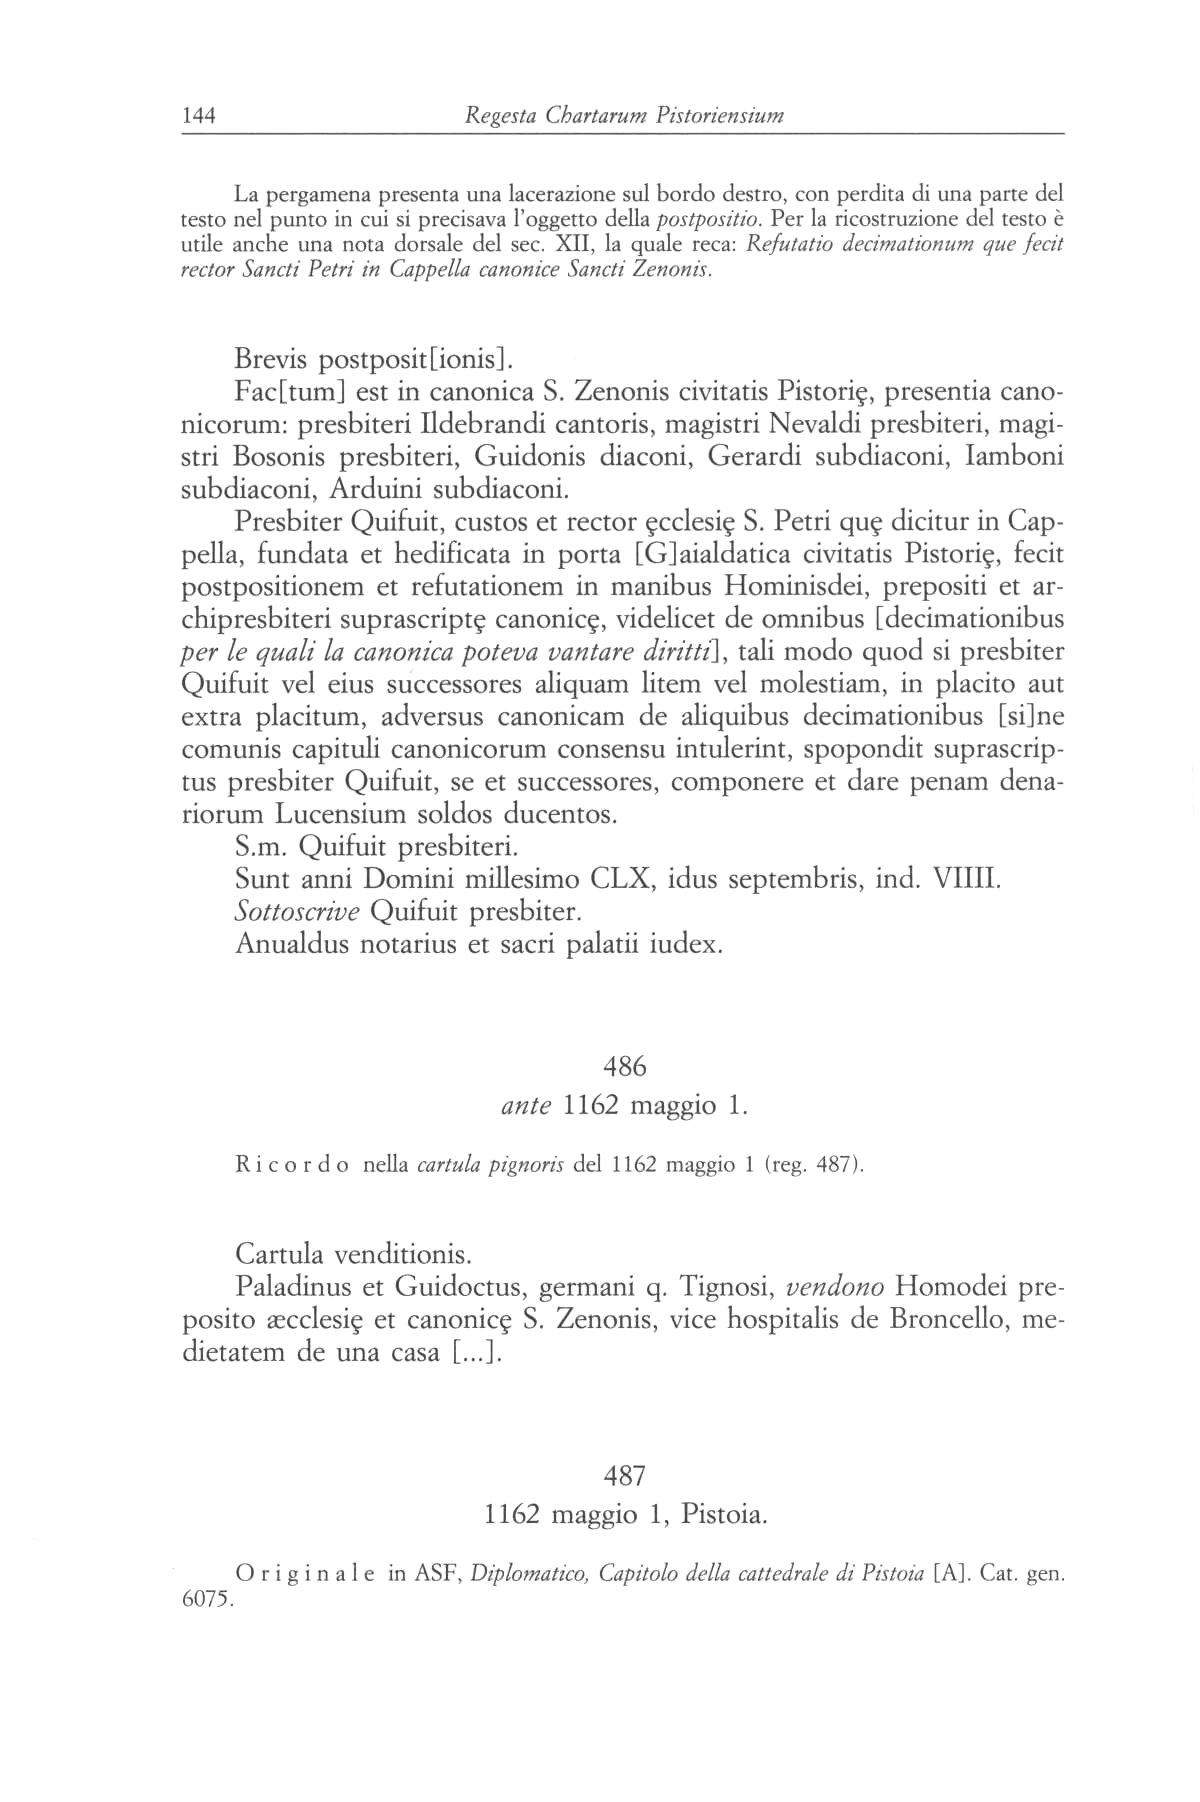 Canonica S. Zenone XII 0144.jpg